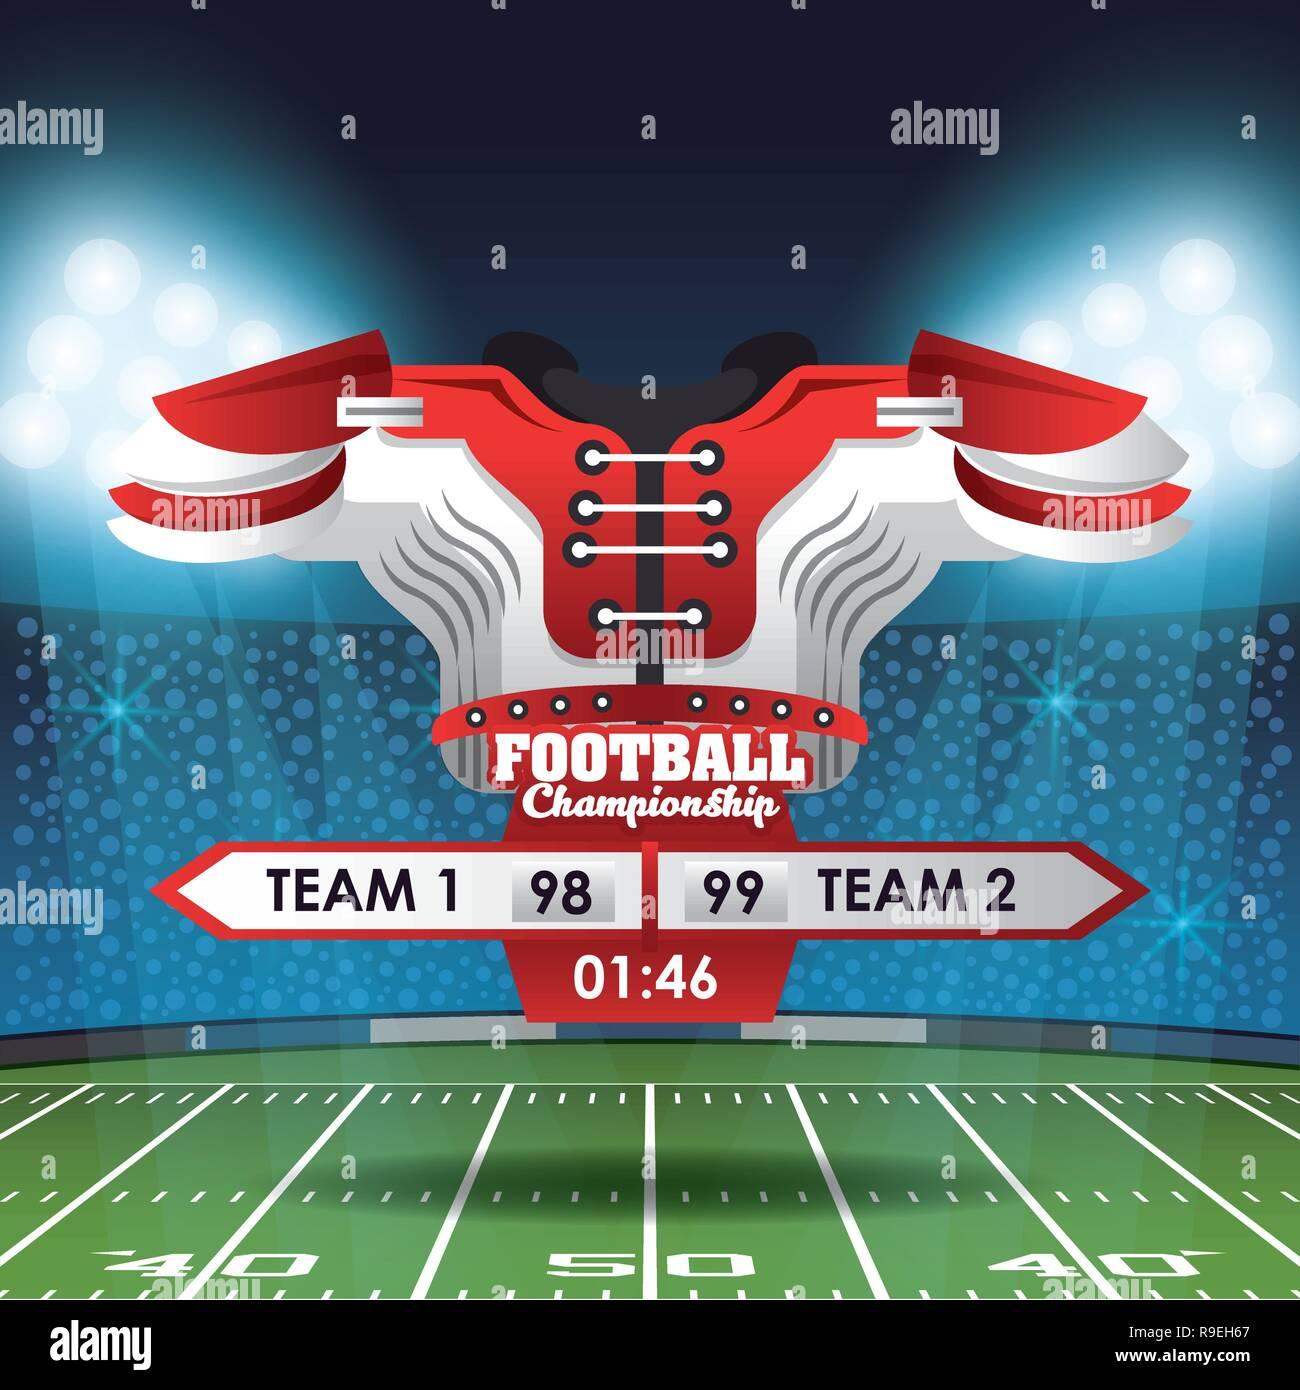 American football championship - Stock Vector